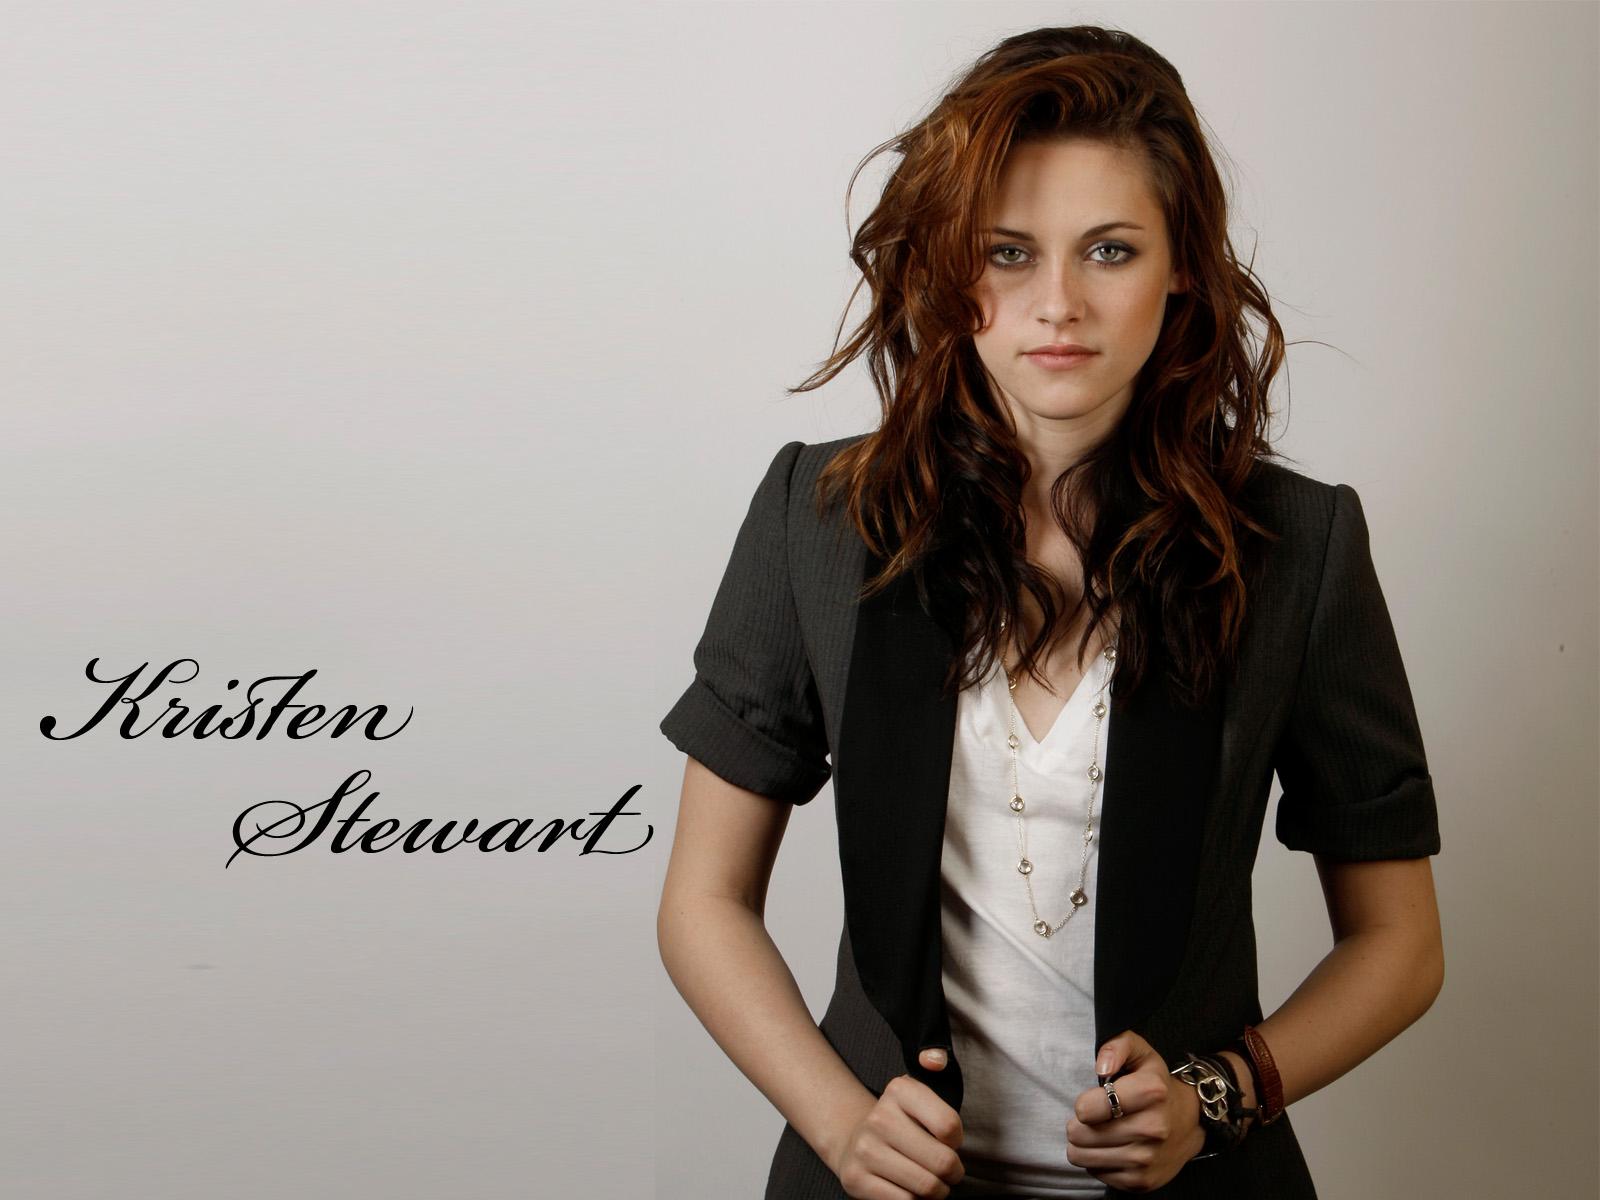 Kristen Stewart Wallpapers HD - WallpaperSafari